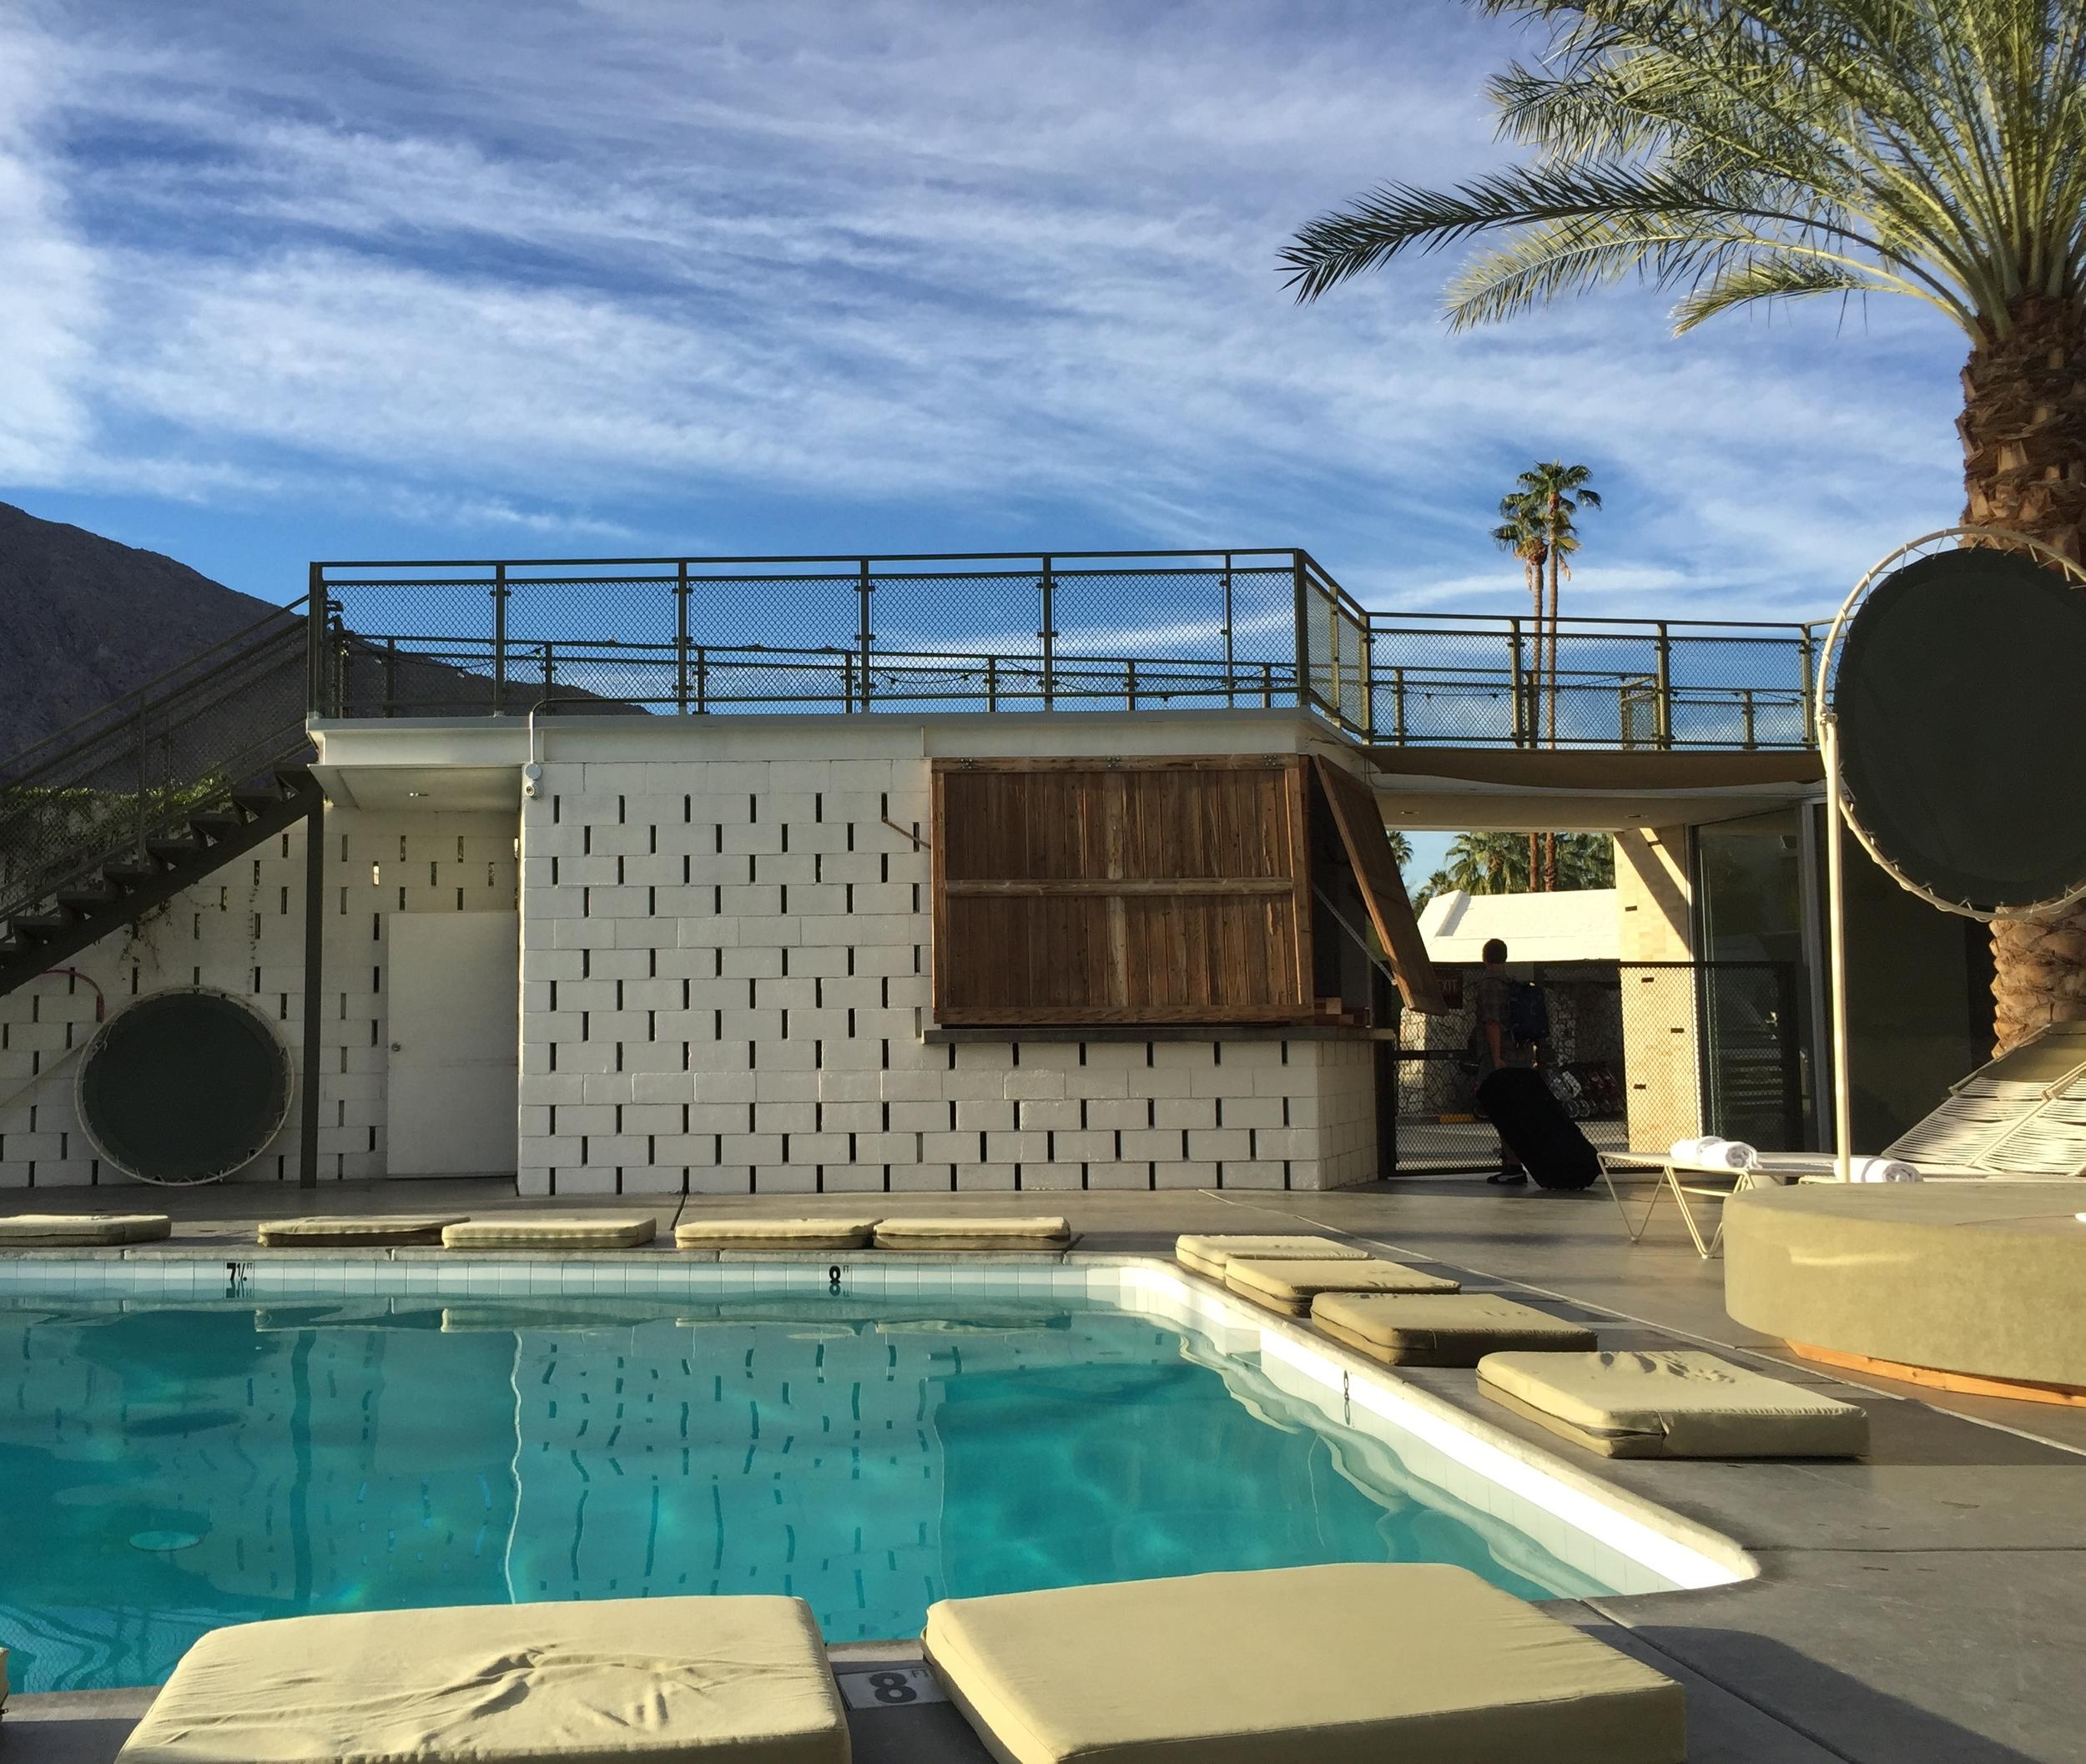 California. Ace Hotel & Swim Club Palm Springs.